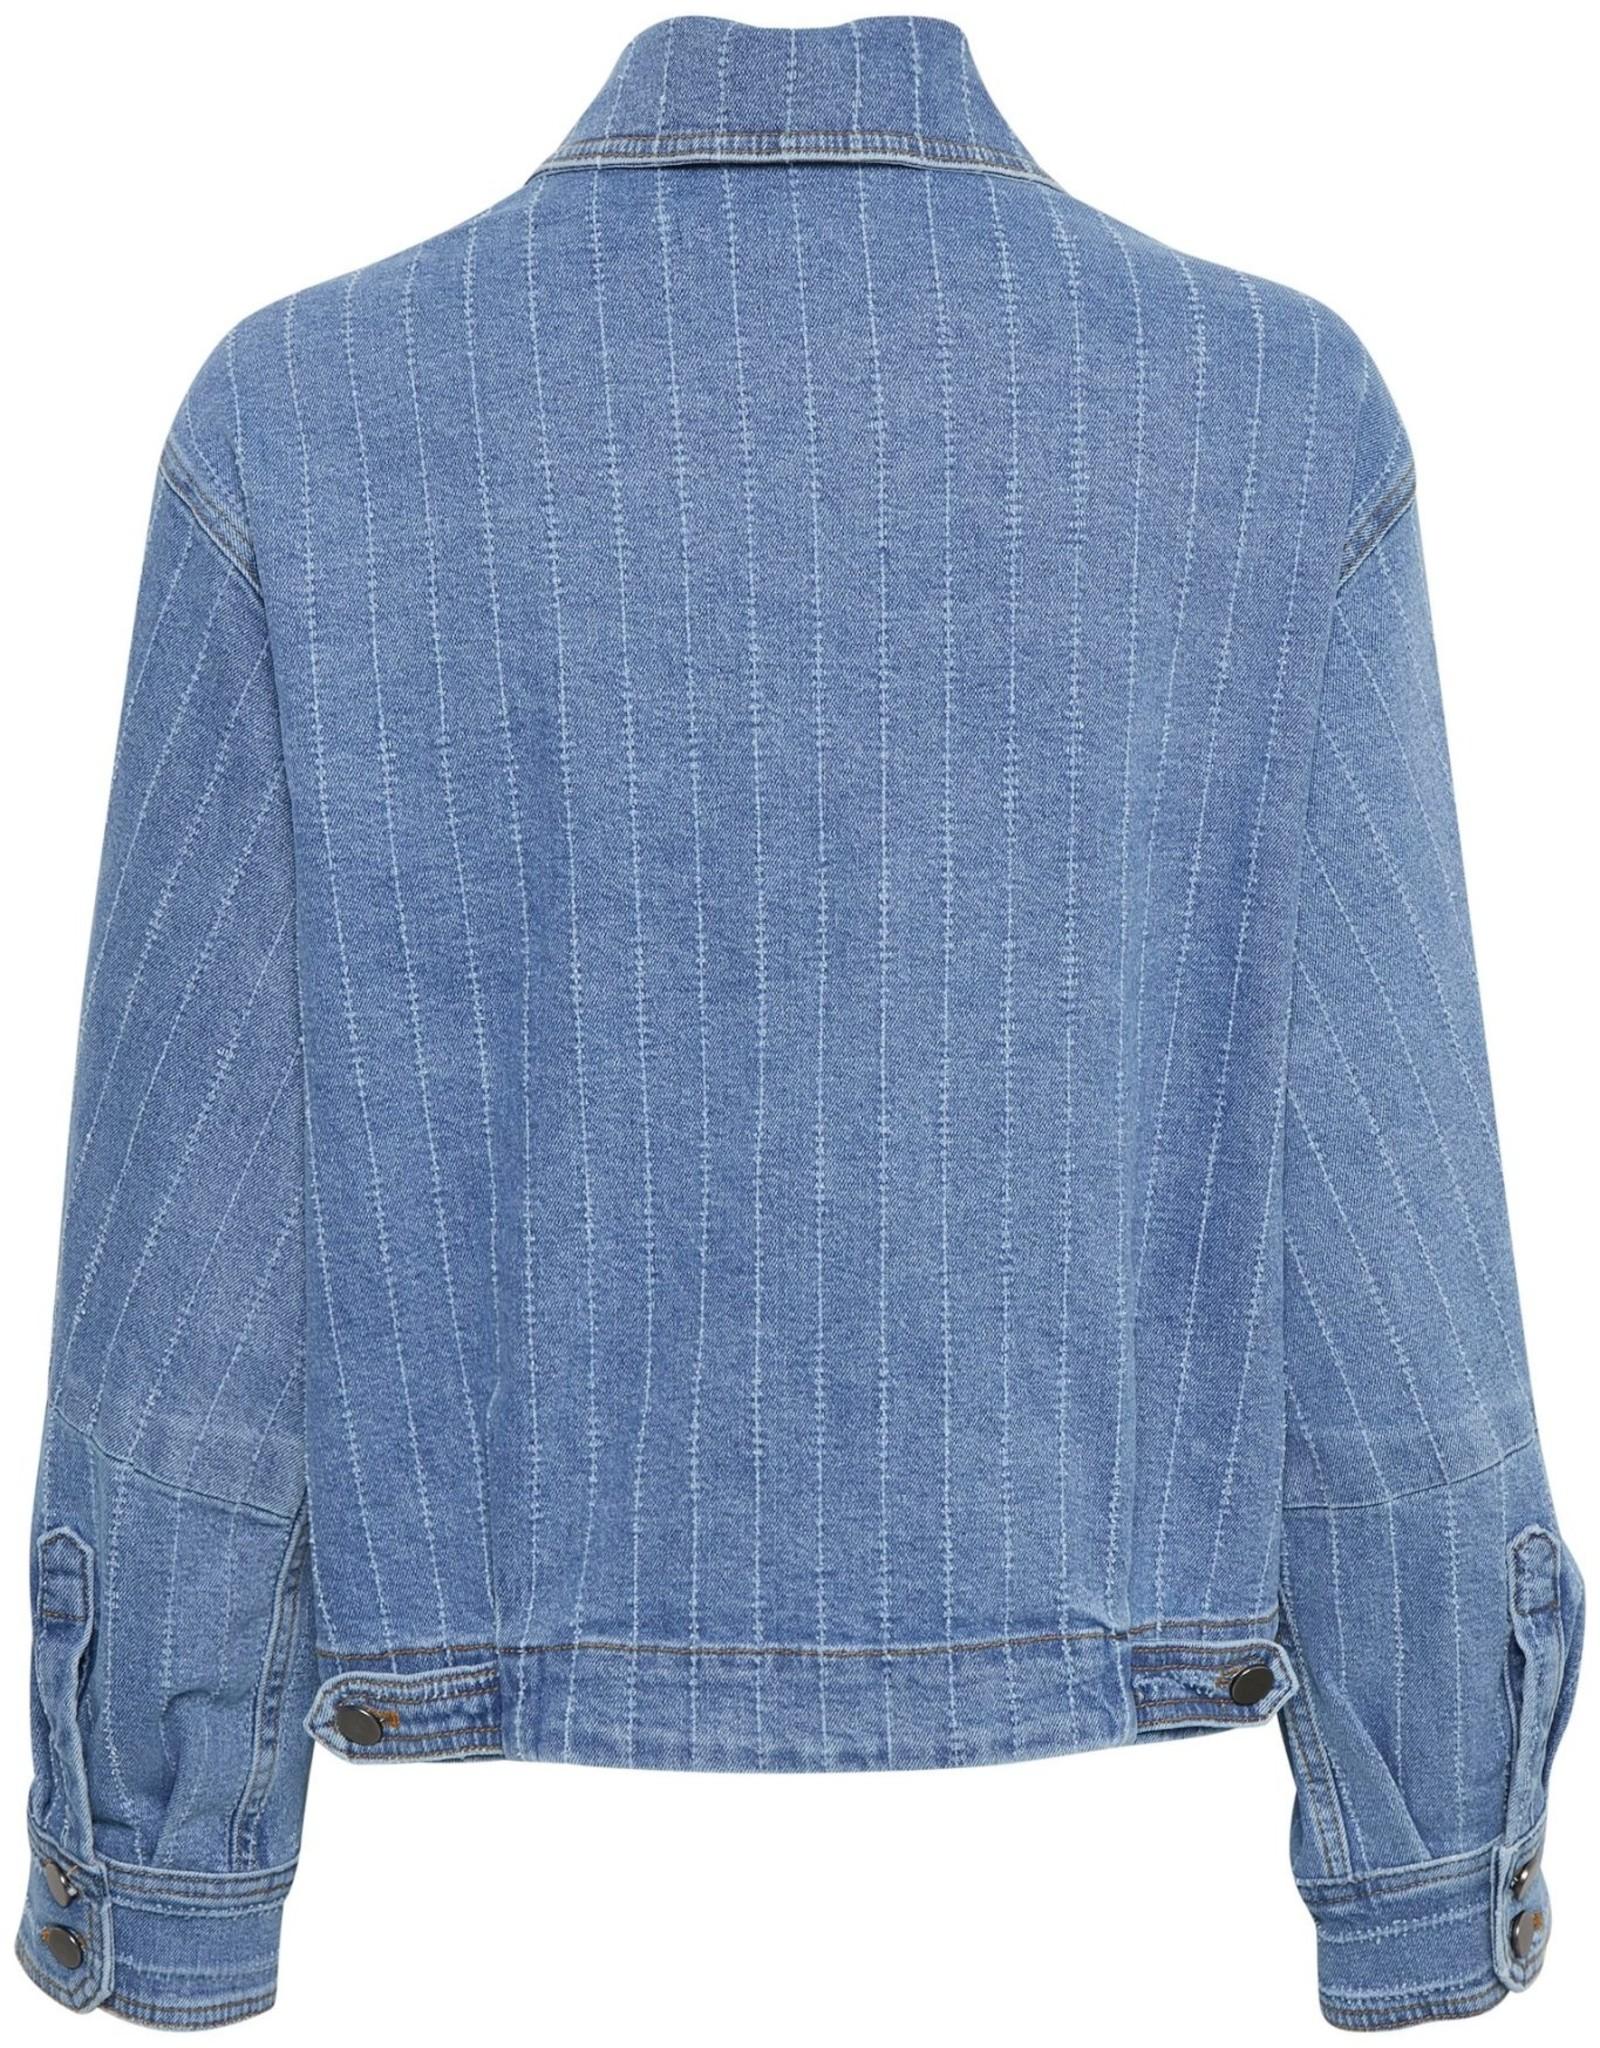 KAREN BY SIMONSEN The Matta Denim Jacket